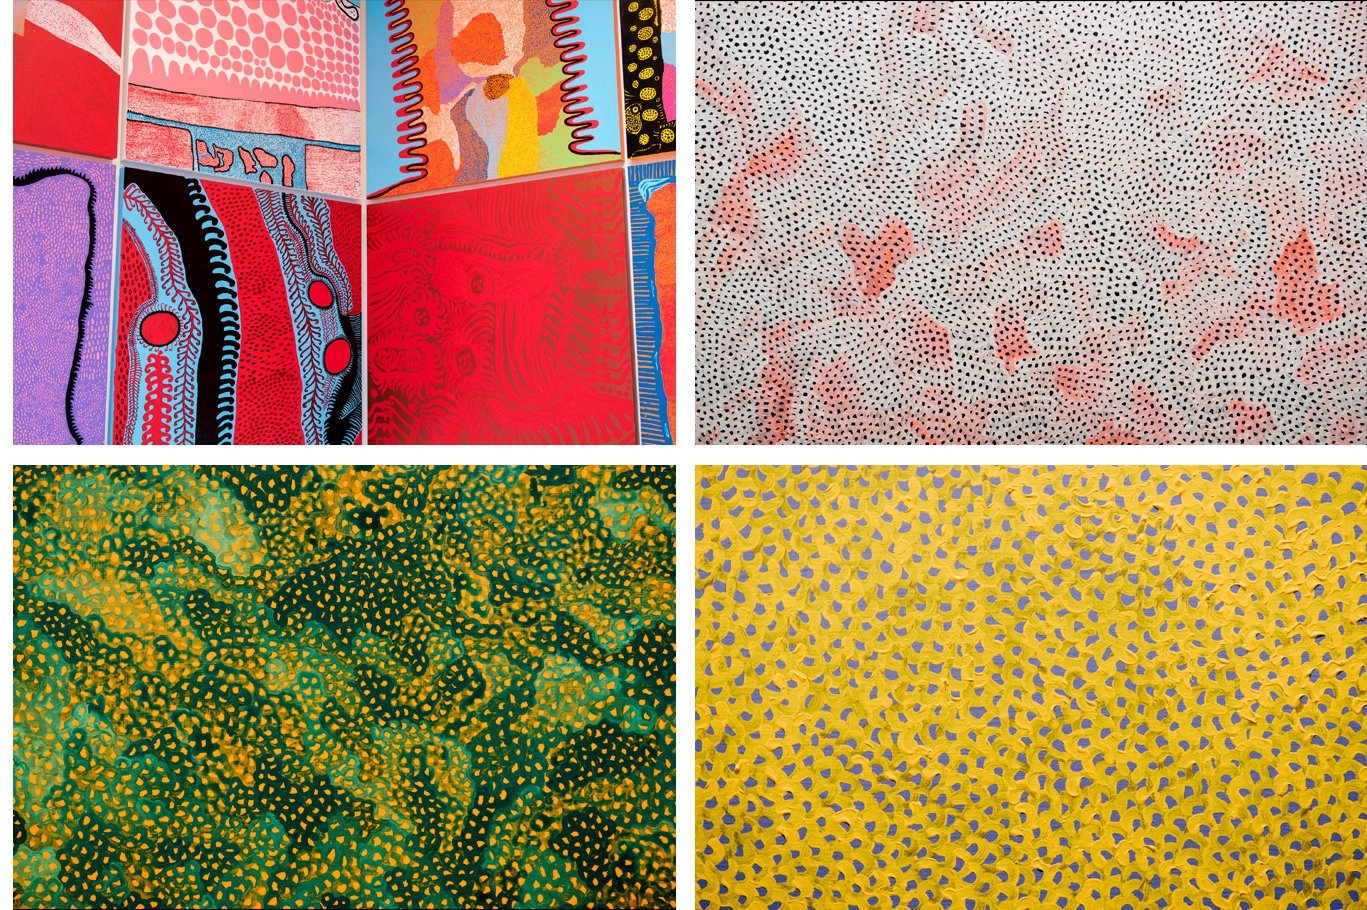 Details of Kusama's paintings